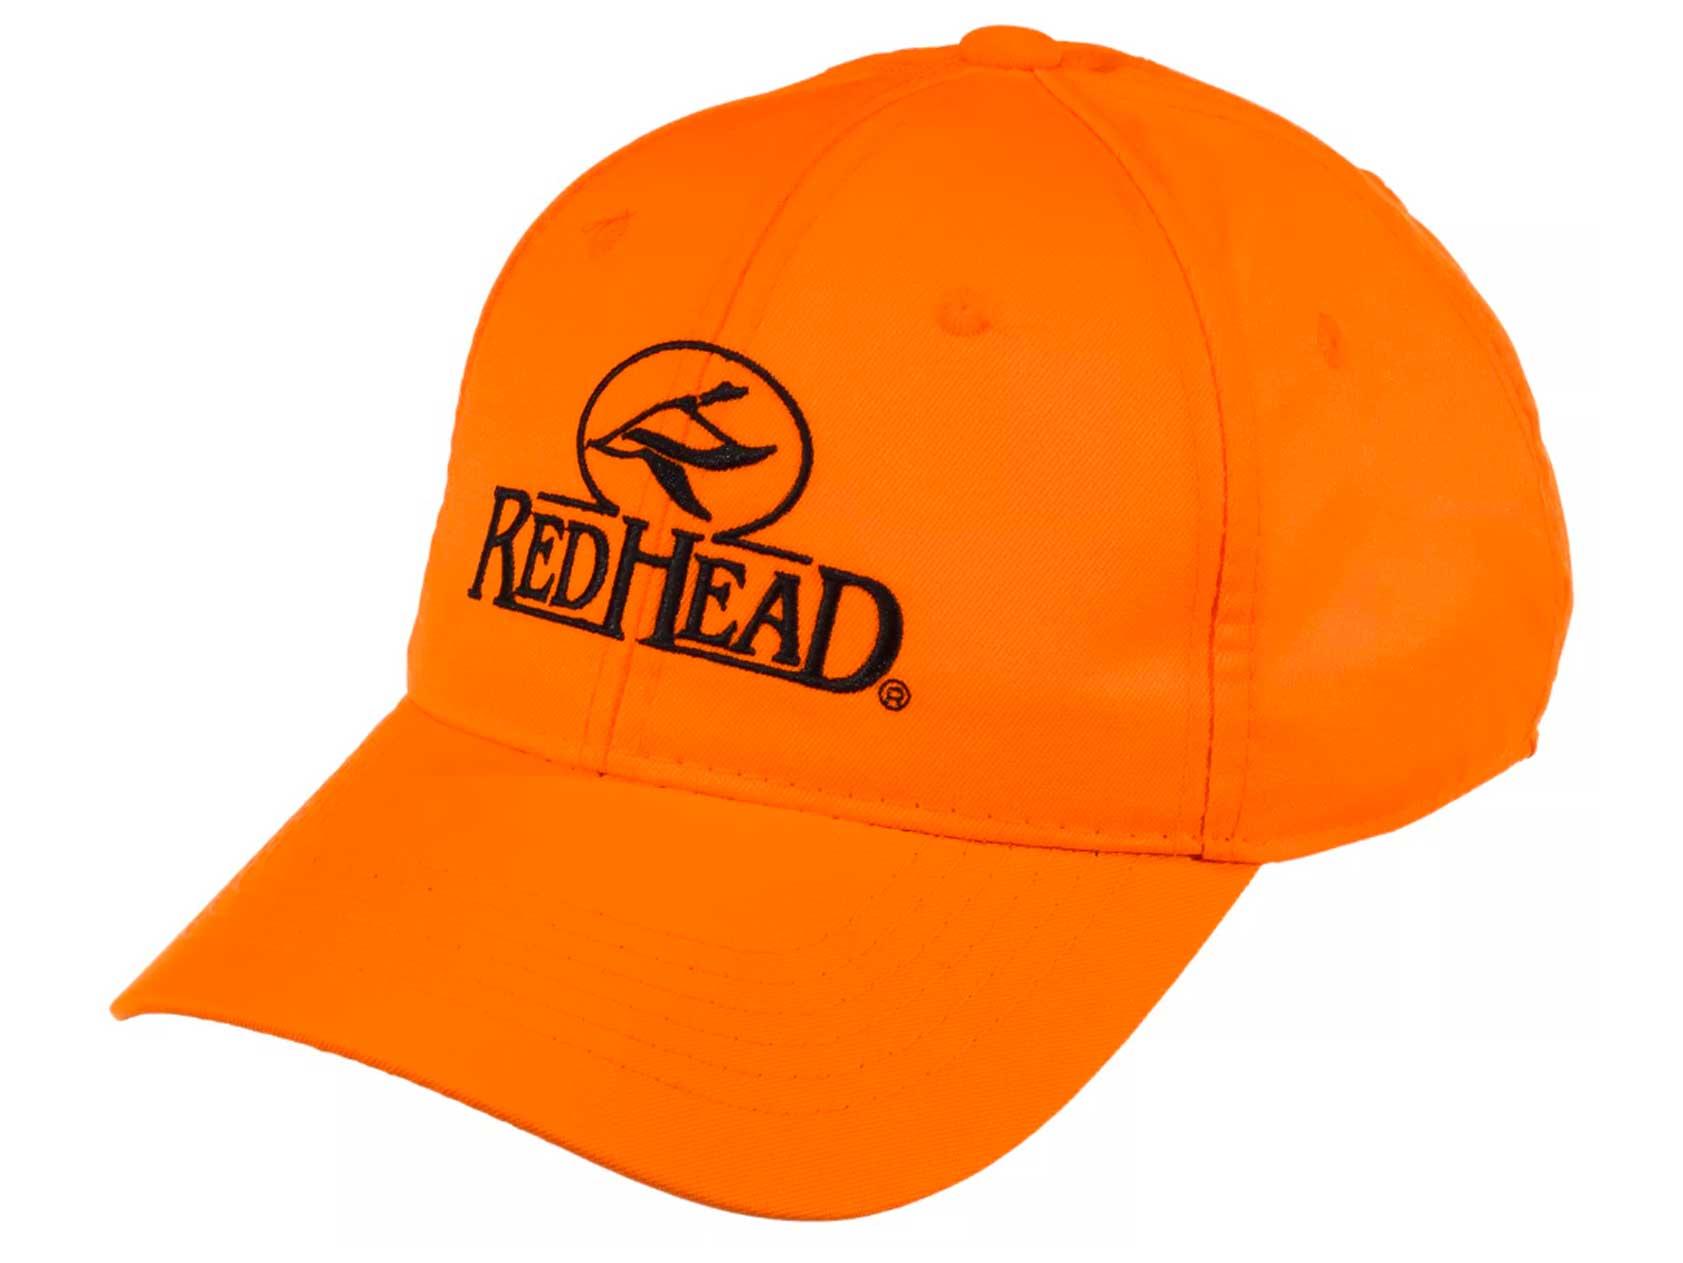 A baseball-style orange hunting cap